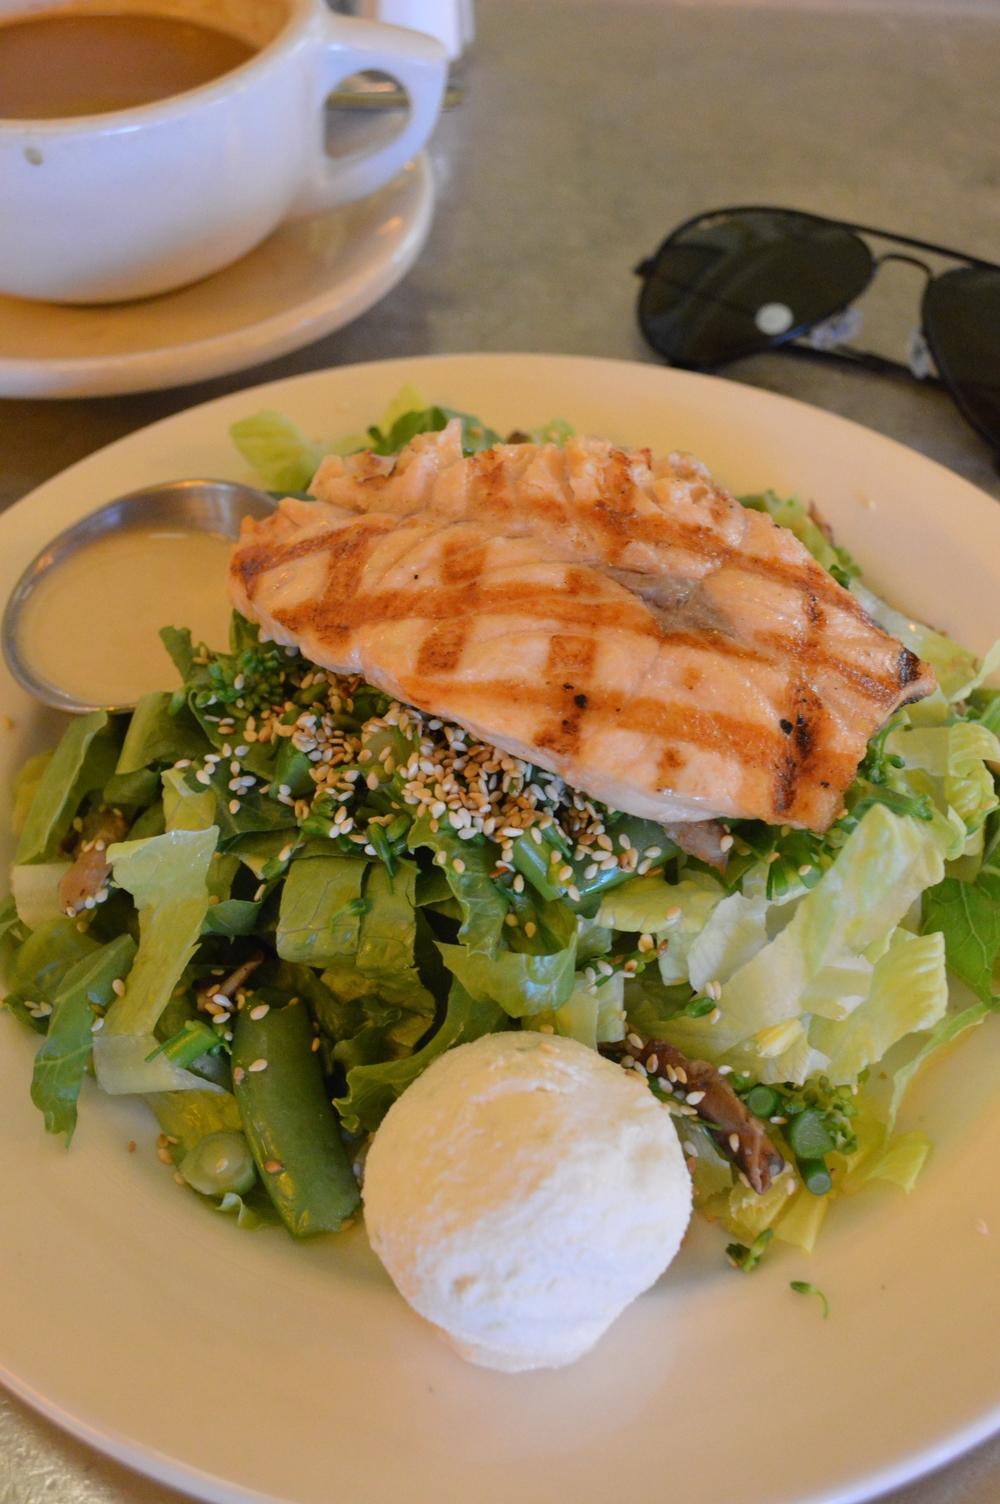 LaurenSchwaiger-Life-Style-Blog-CanCan-Carytown-RVA-Salmon-Salad.jpg